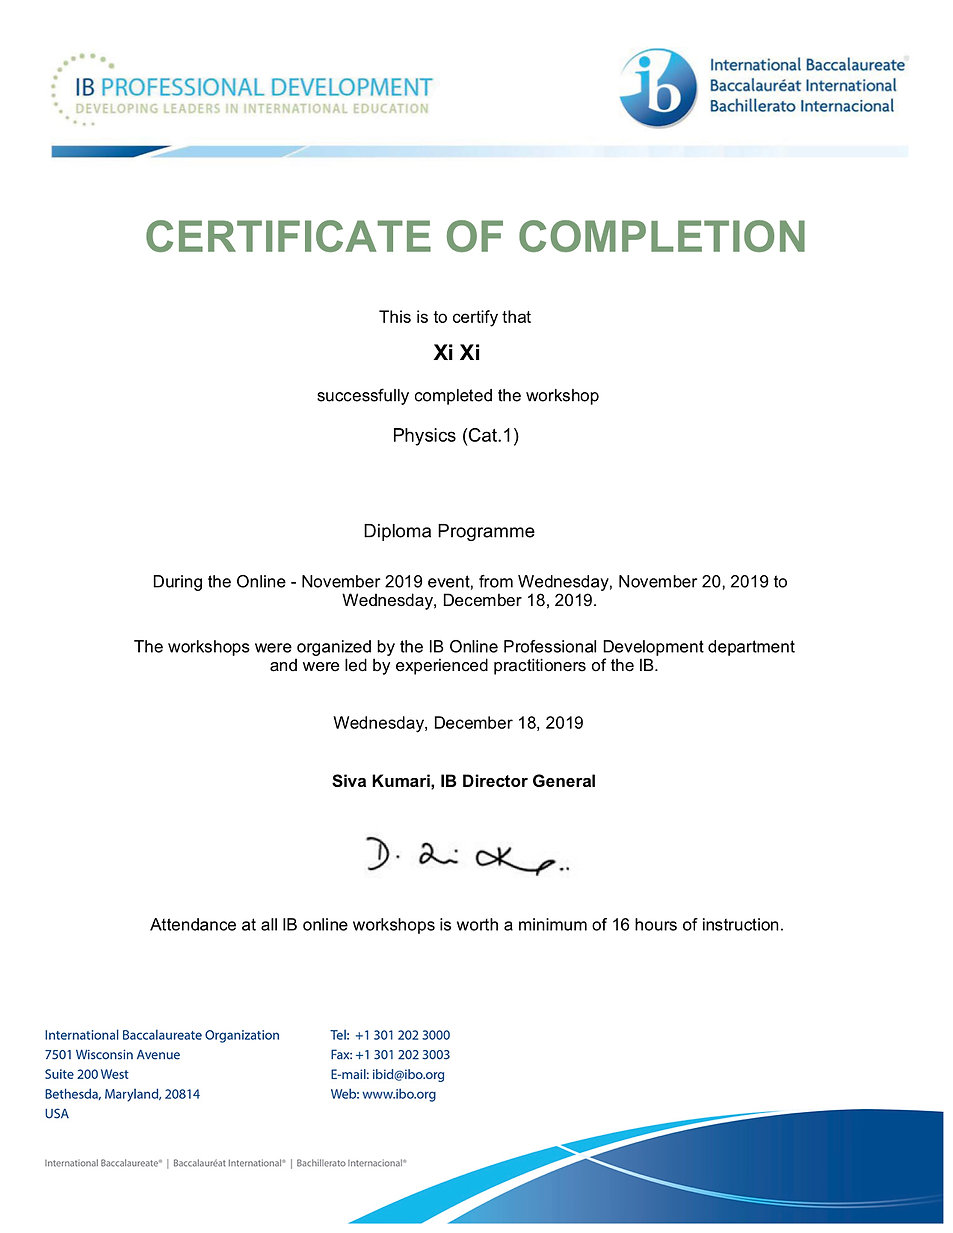 IB Certicate for Physics Xi Xi.jpg